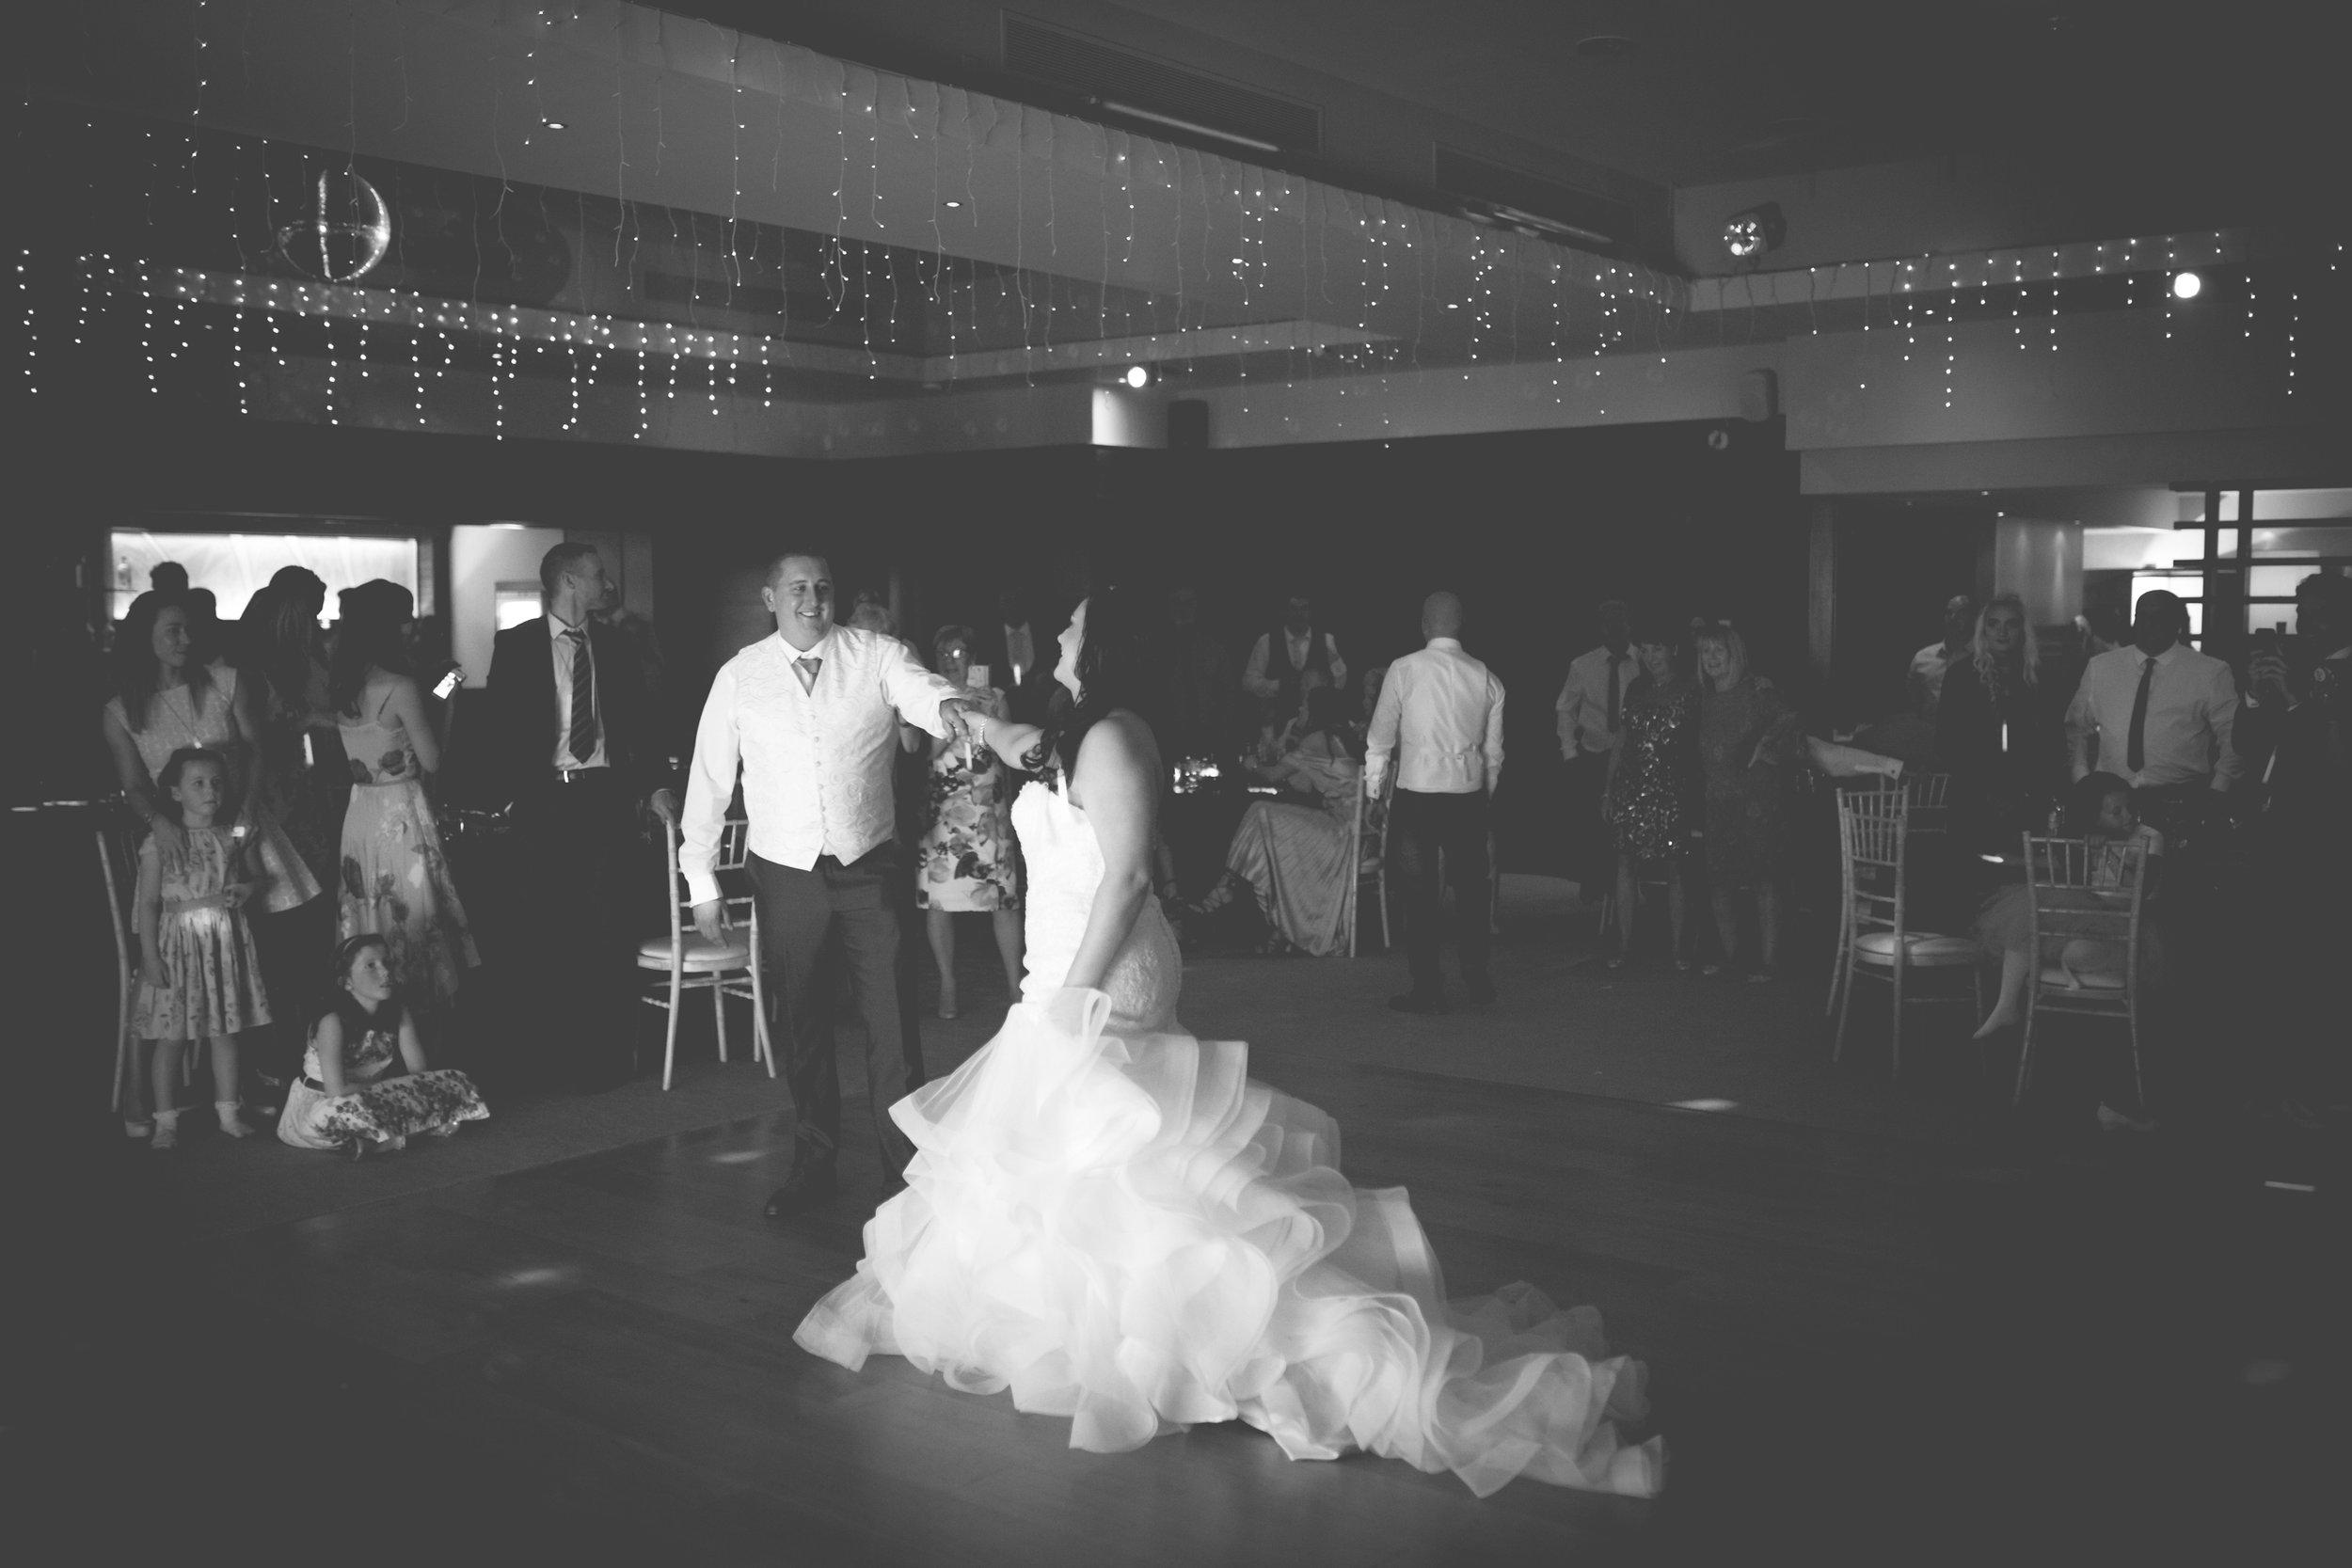 Helena & Terence - First Dance-18.jpg